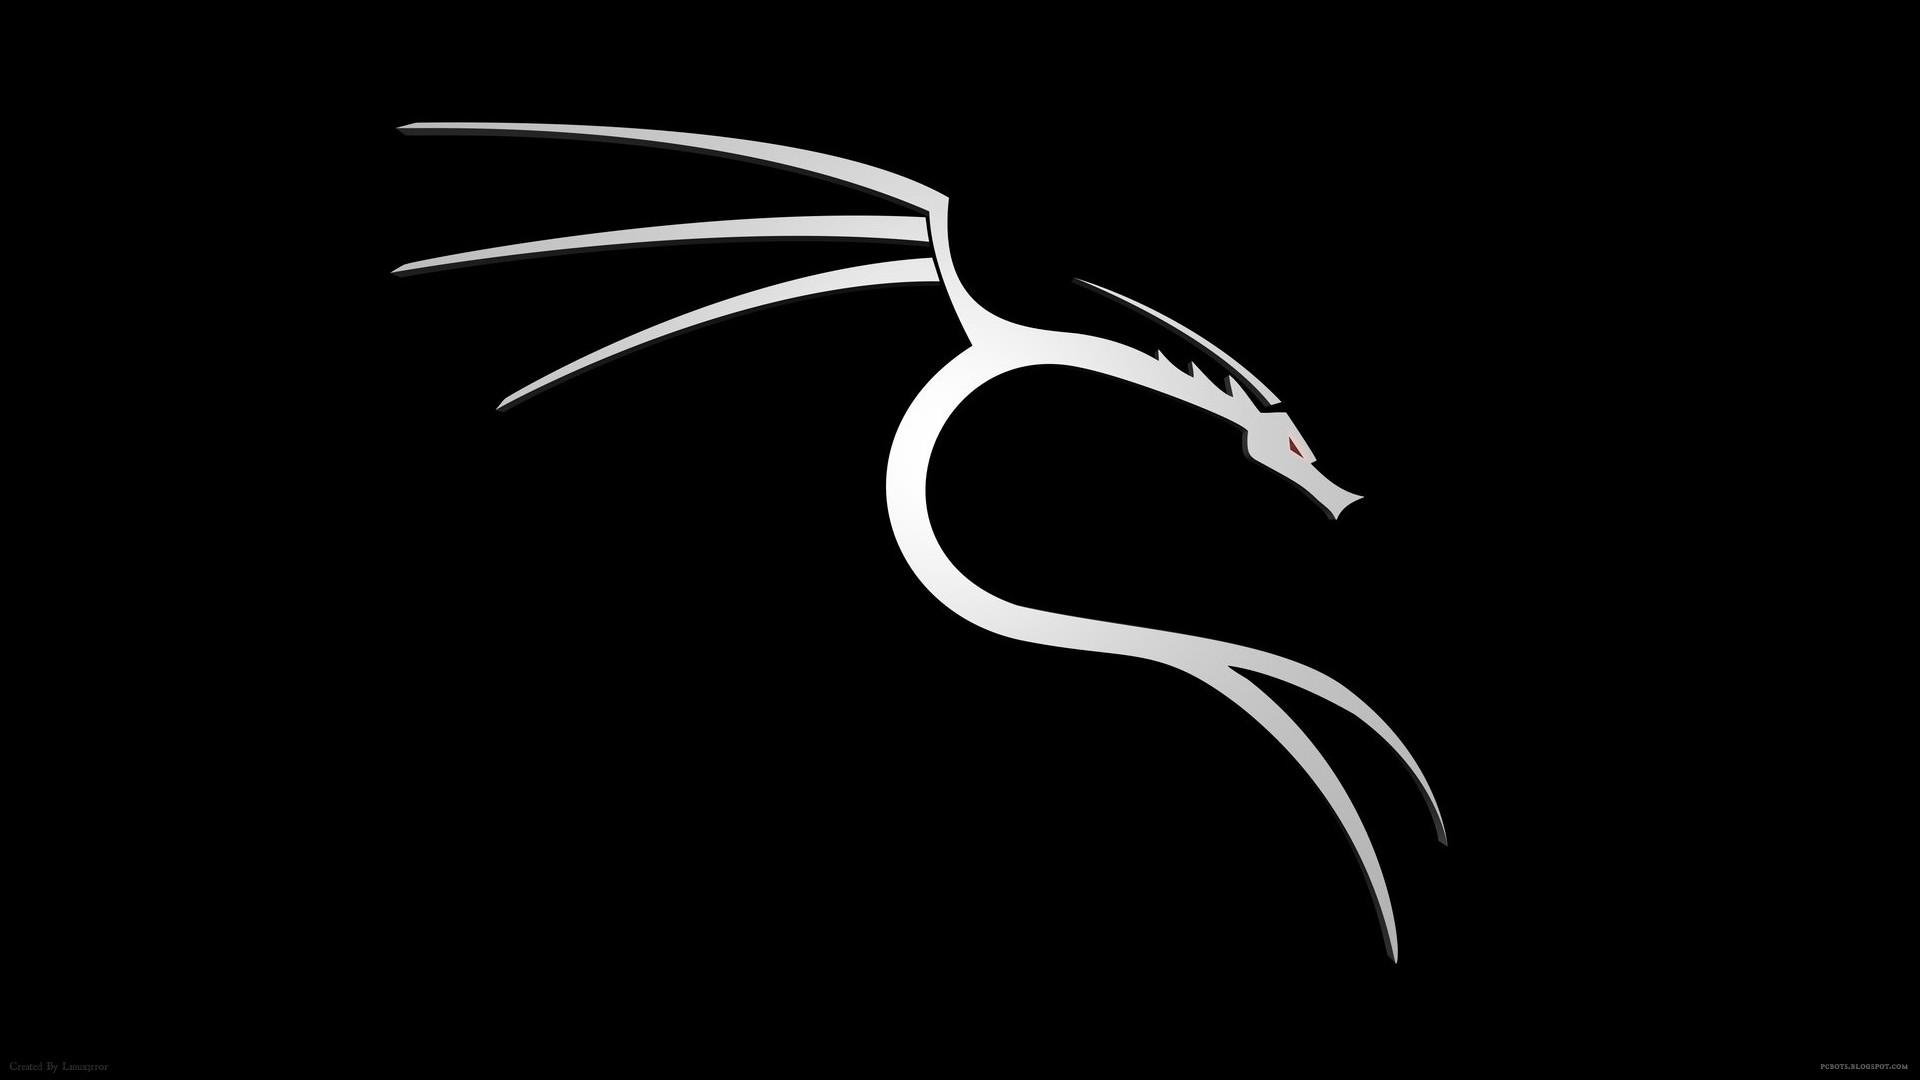 px Hacker Widescreen Image | Wonderful Photos, v.274